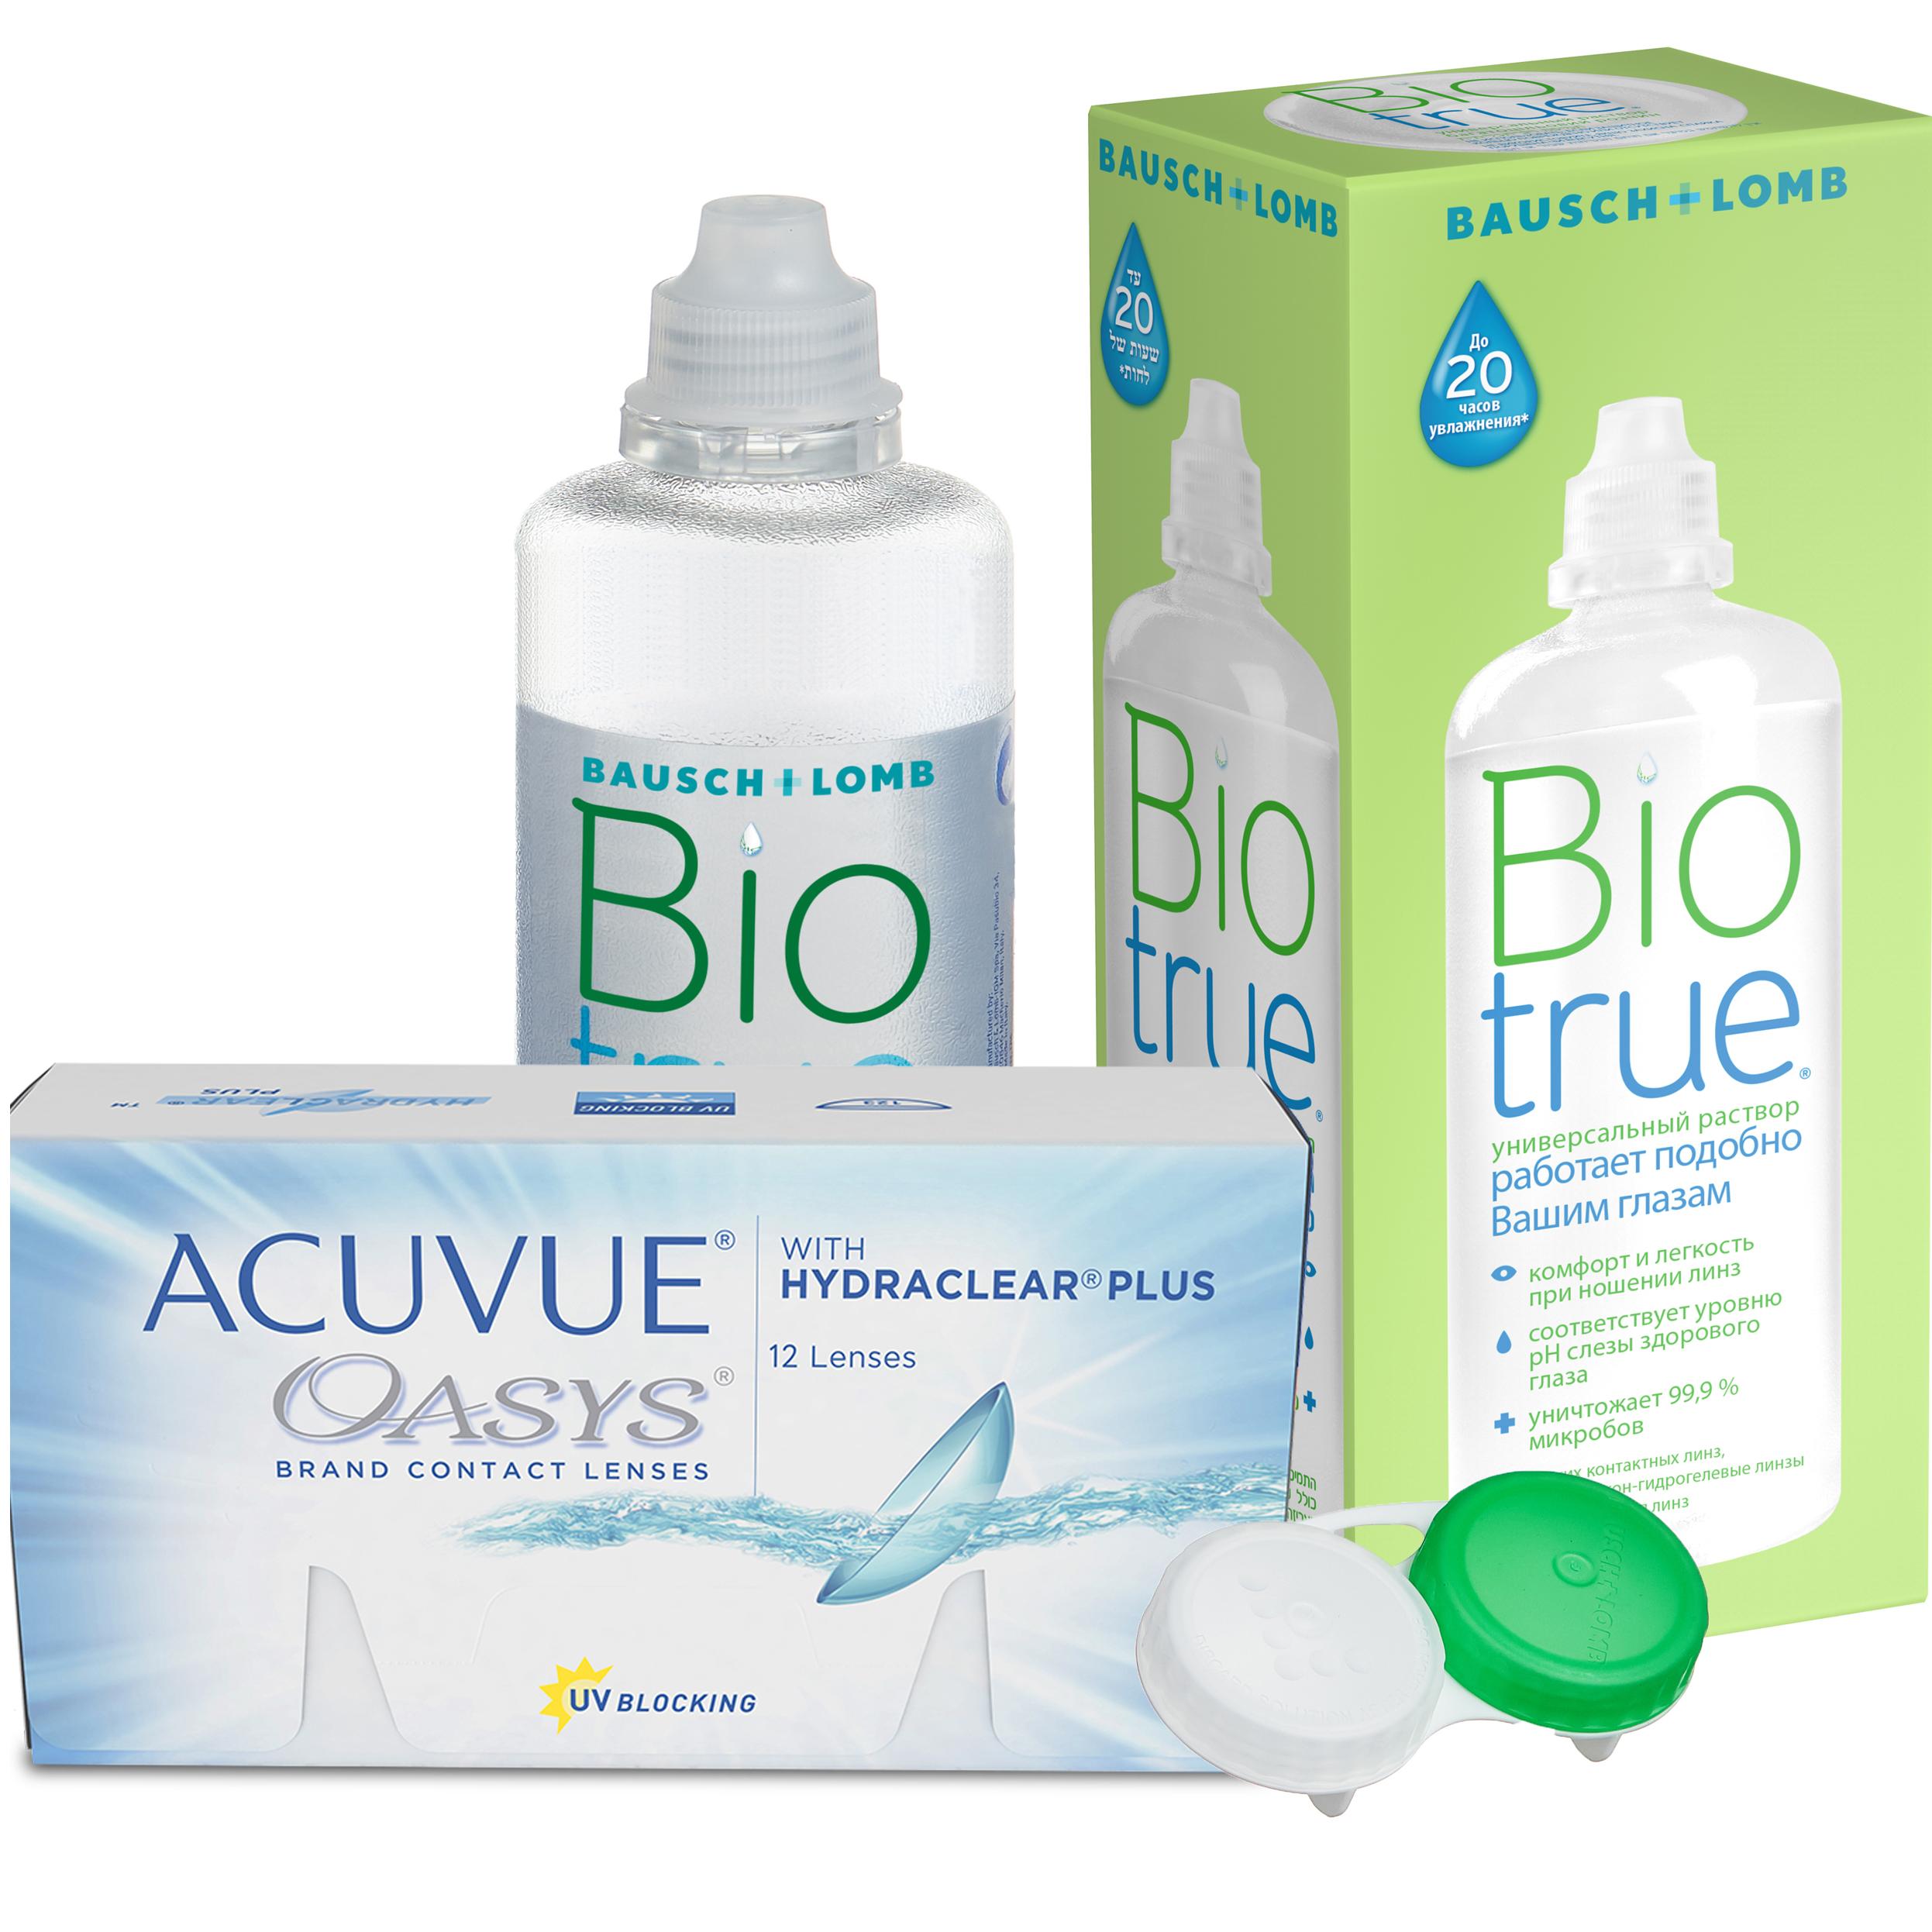 Купить Oasys with Hydraclear Plus 12 линз + Biotrue, Контактные линзы Acuvue Oasys with Hydraclear Plus 12 линз R 8.4 +2, 50 + Biotrue 300 мл